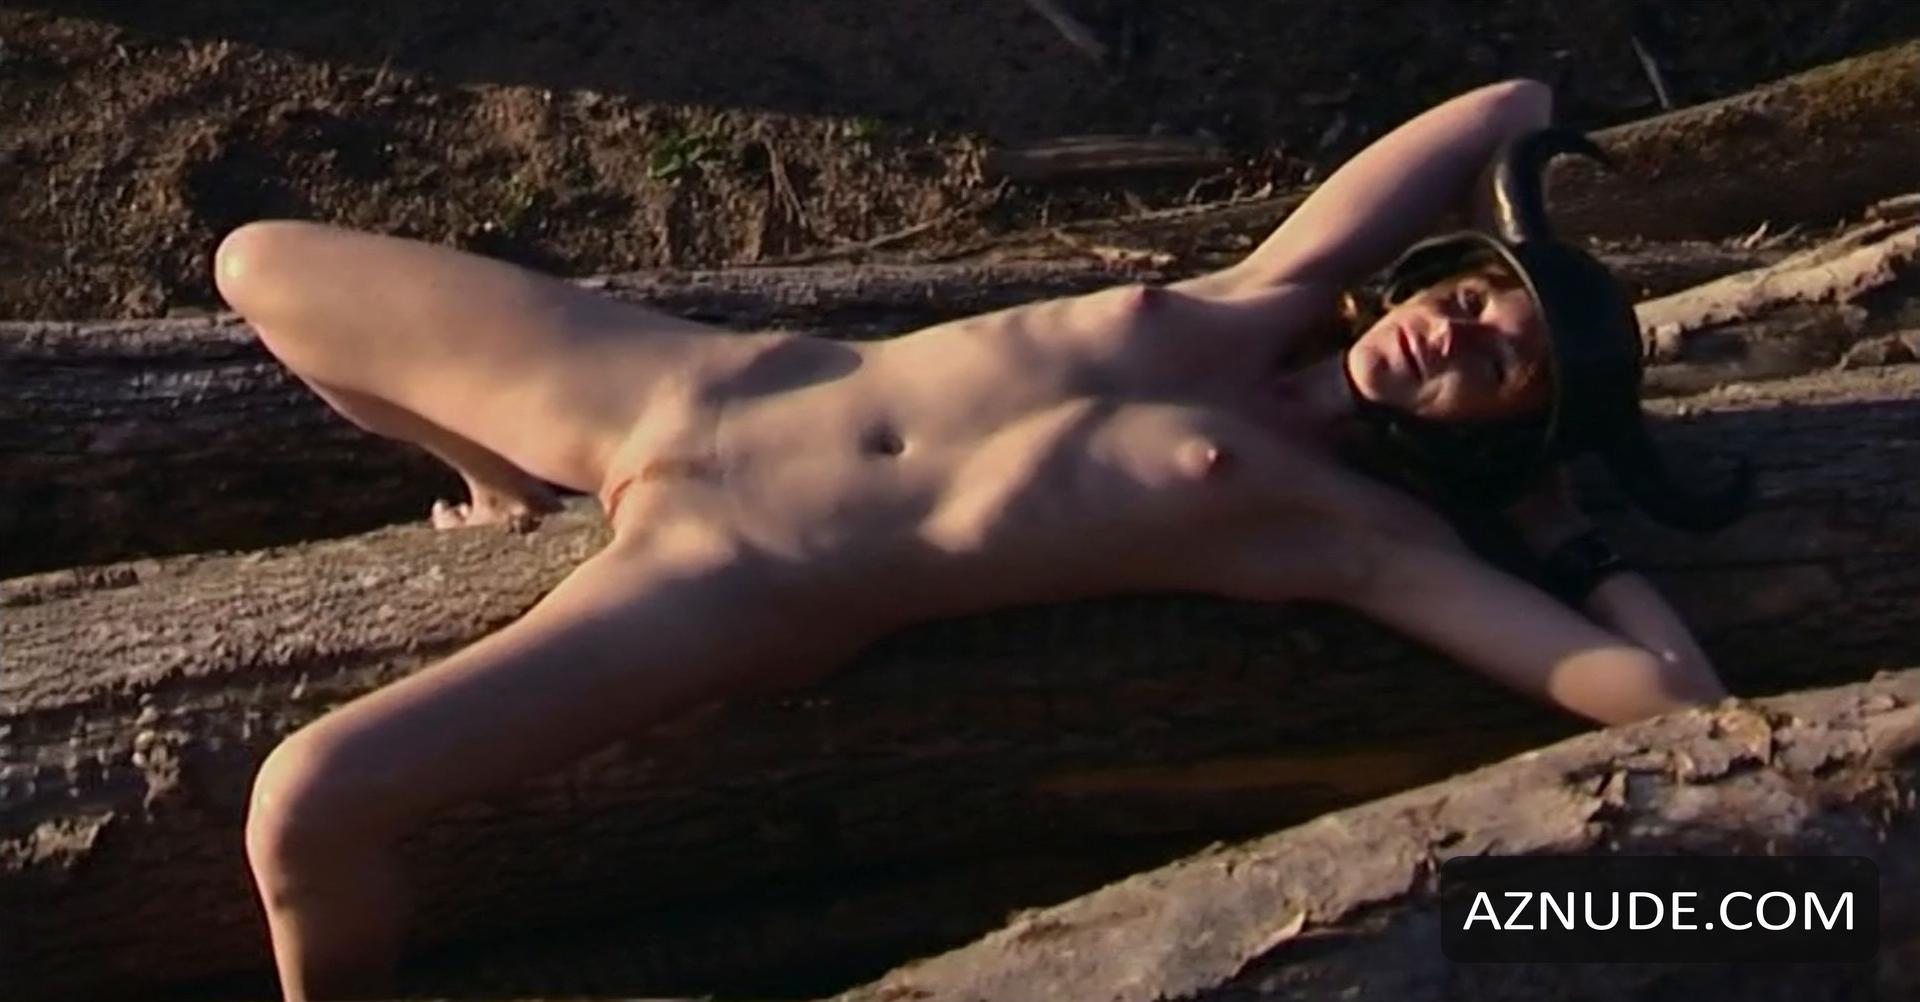 Antje mönning nude